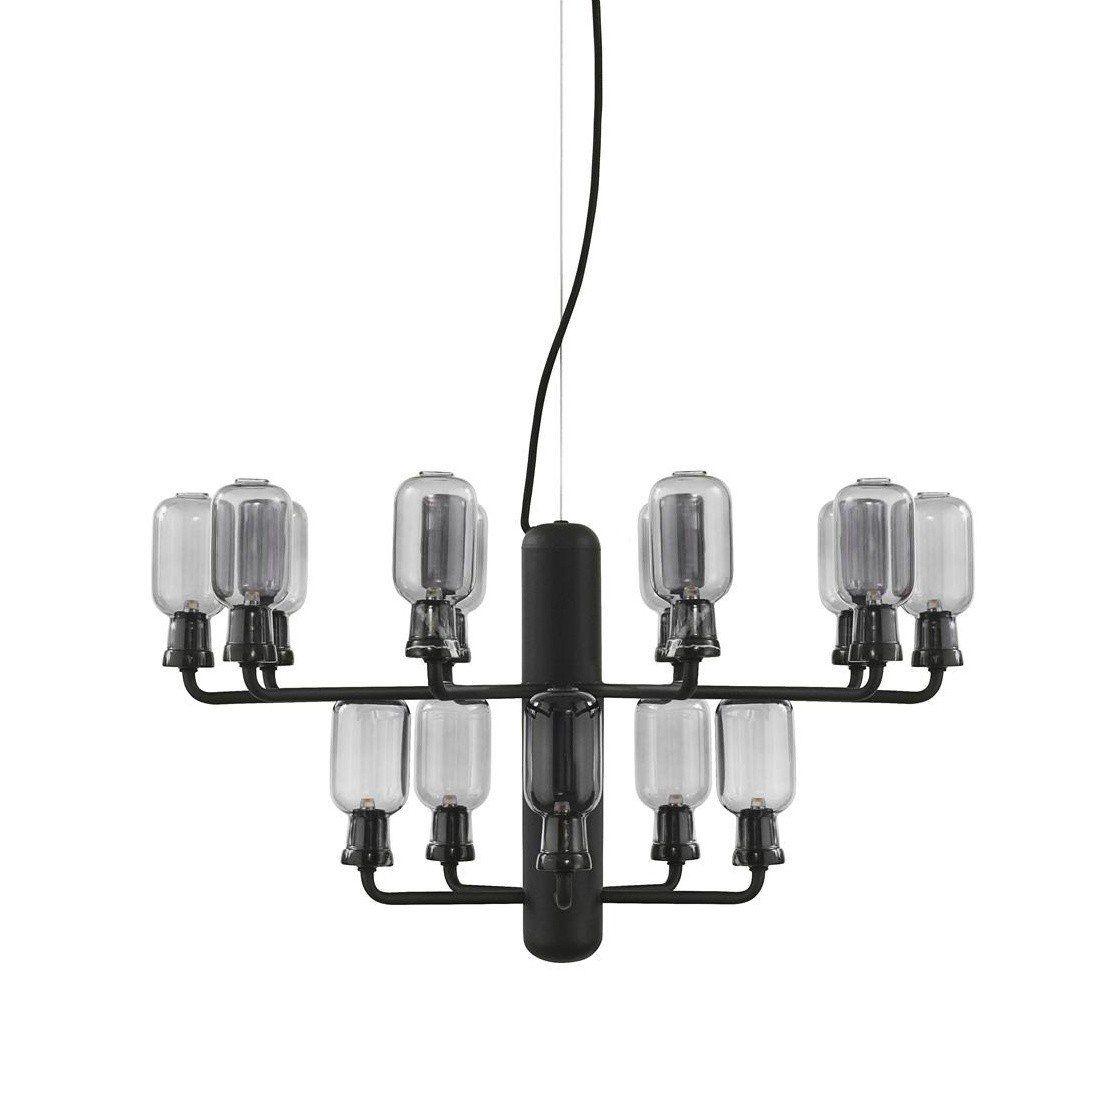 amp chandelier small normann copenhagen. Black Bedroom Furniture Sets. Home Design Ideas